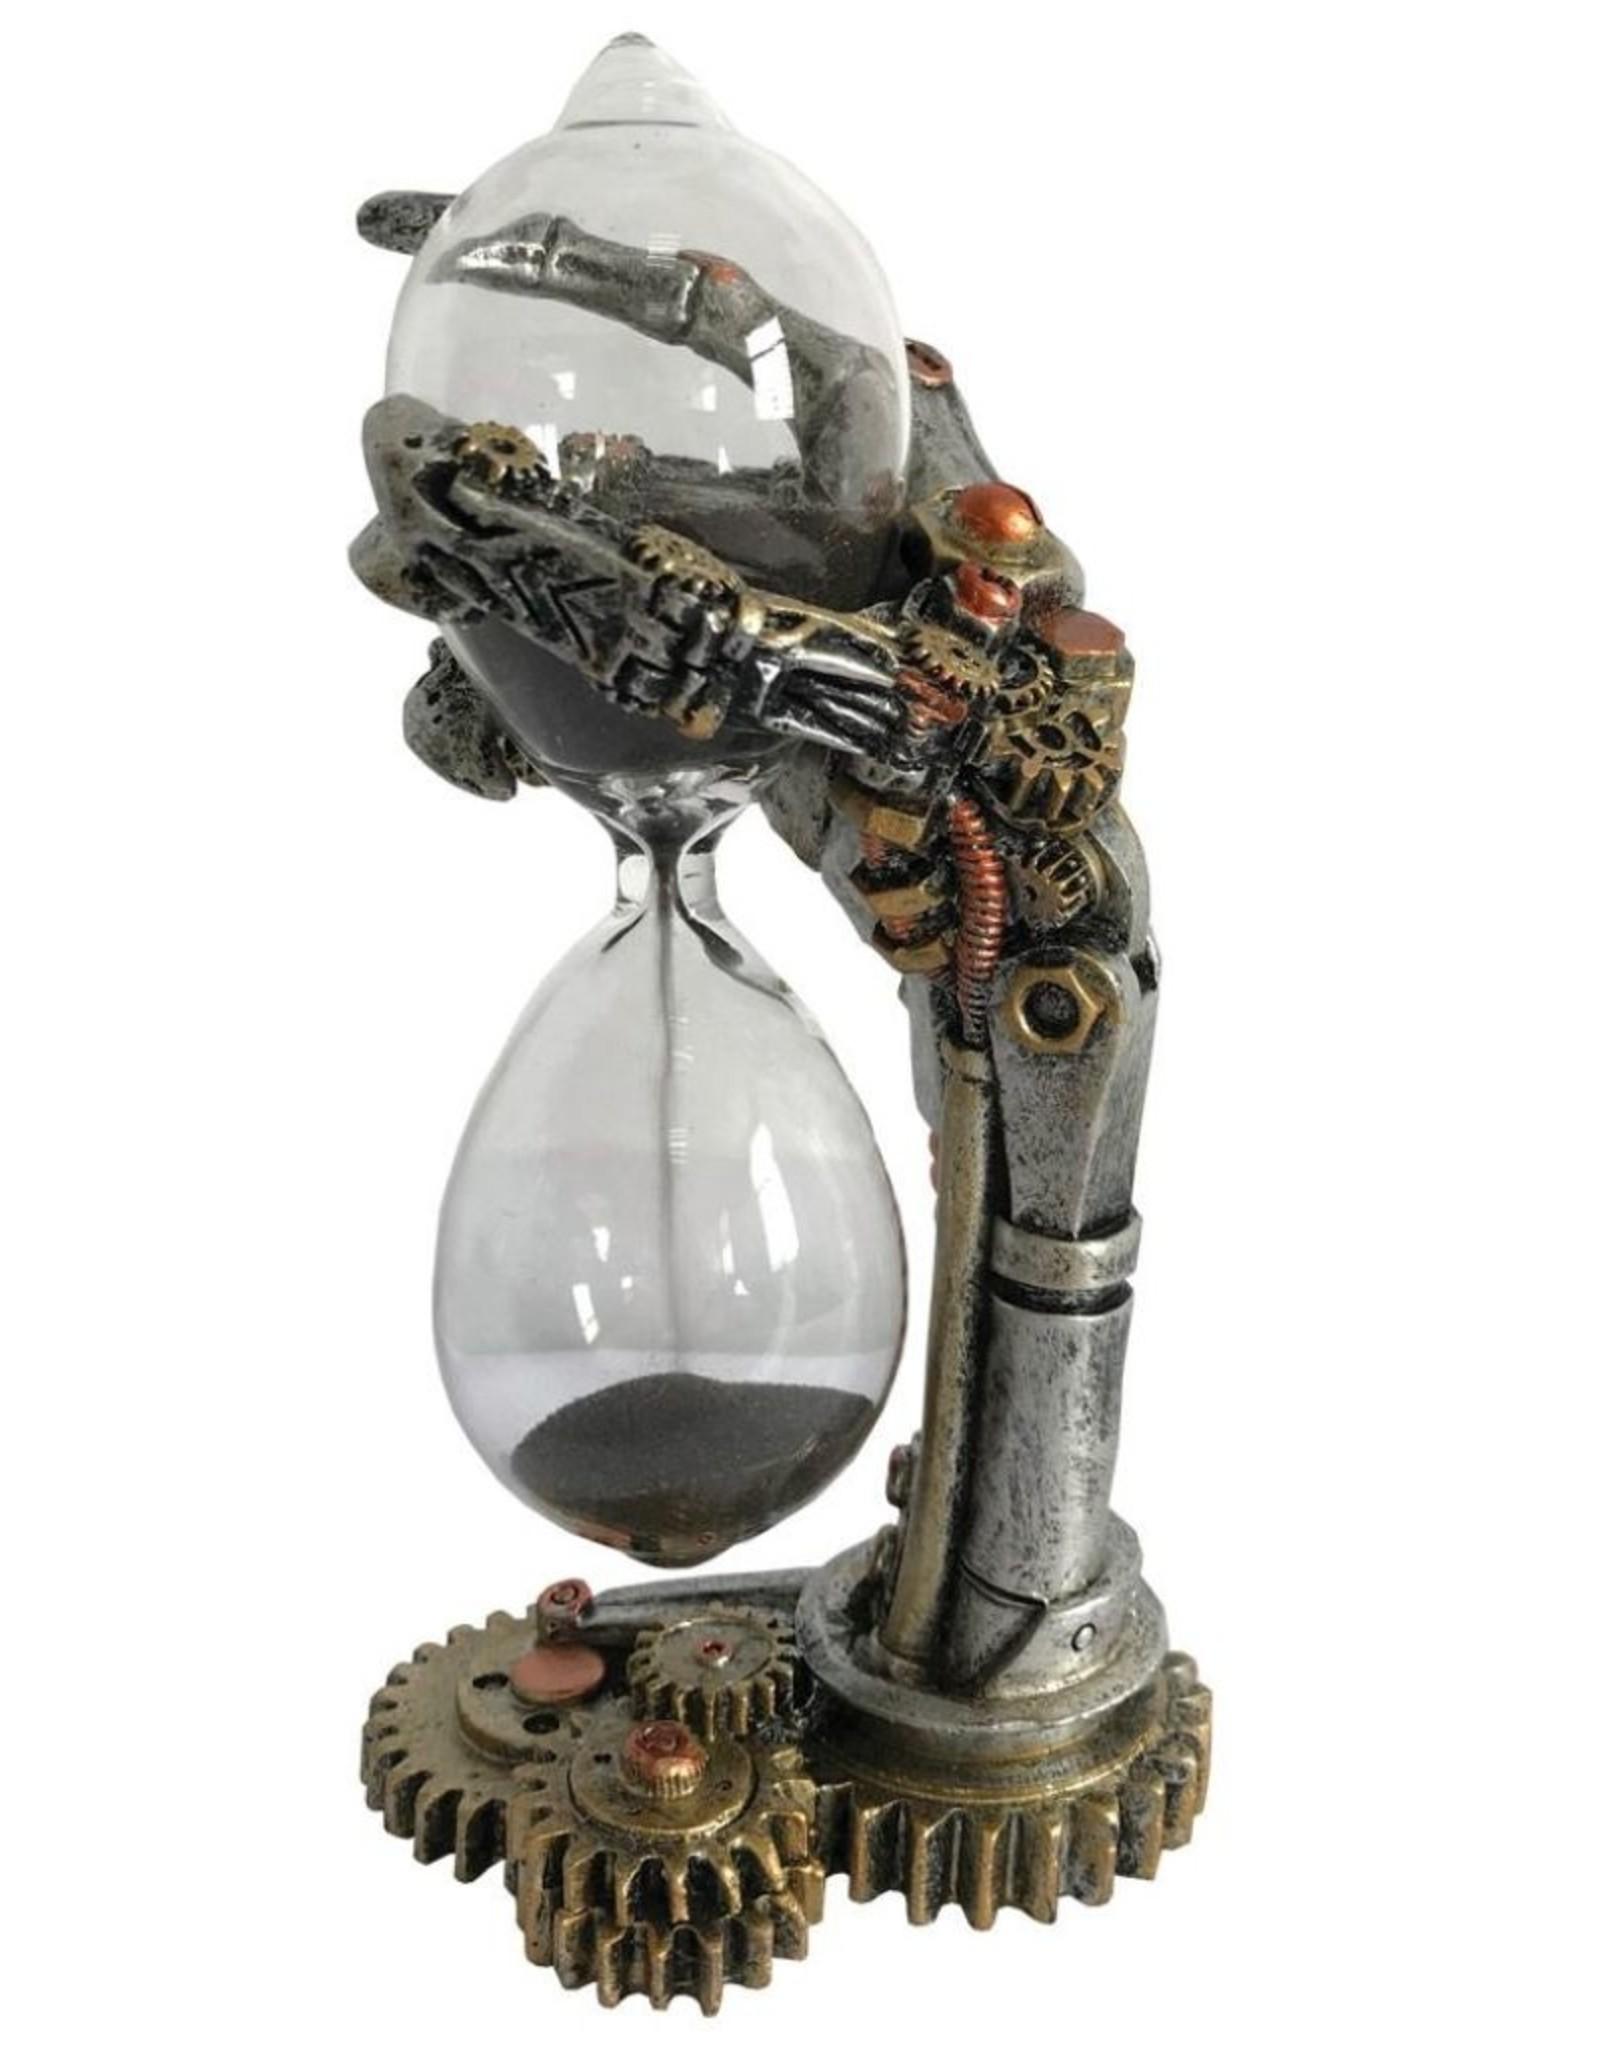 Alator Gothic accessoires Steampunk accessoires - Steampunk Zandloper Time after Time - Nemesis Now